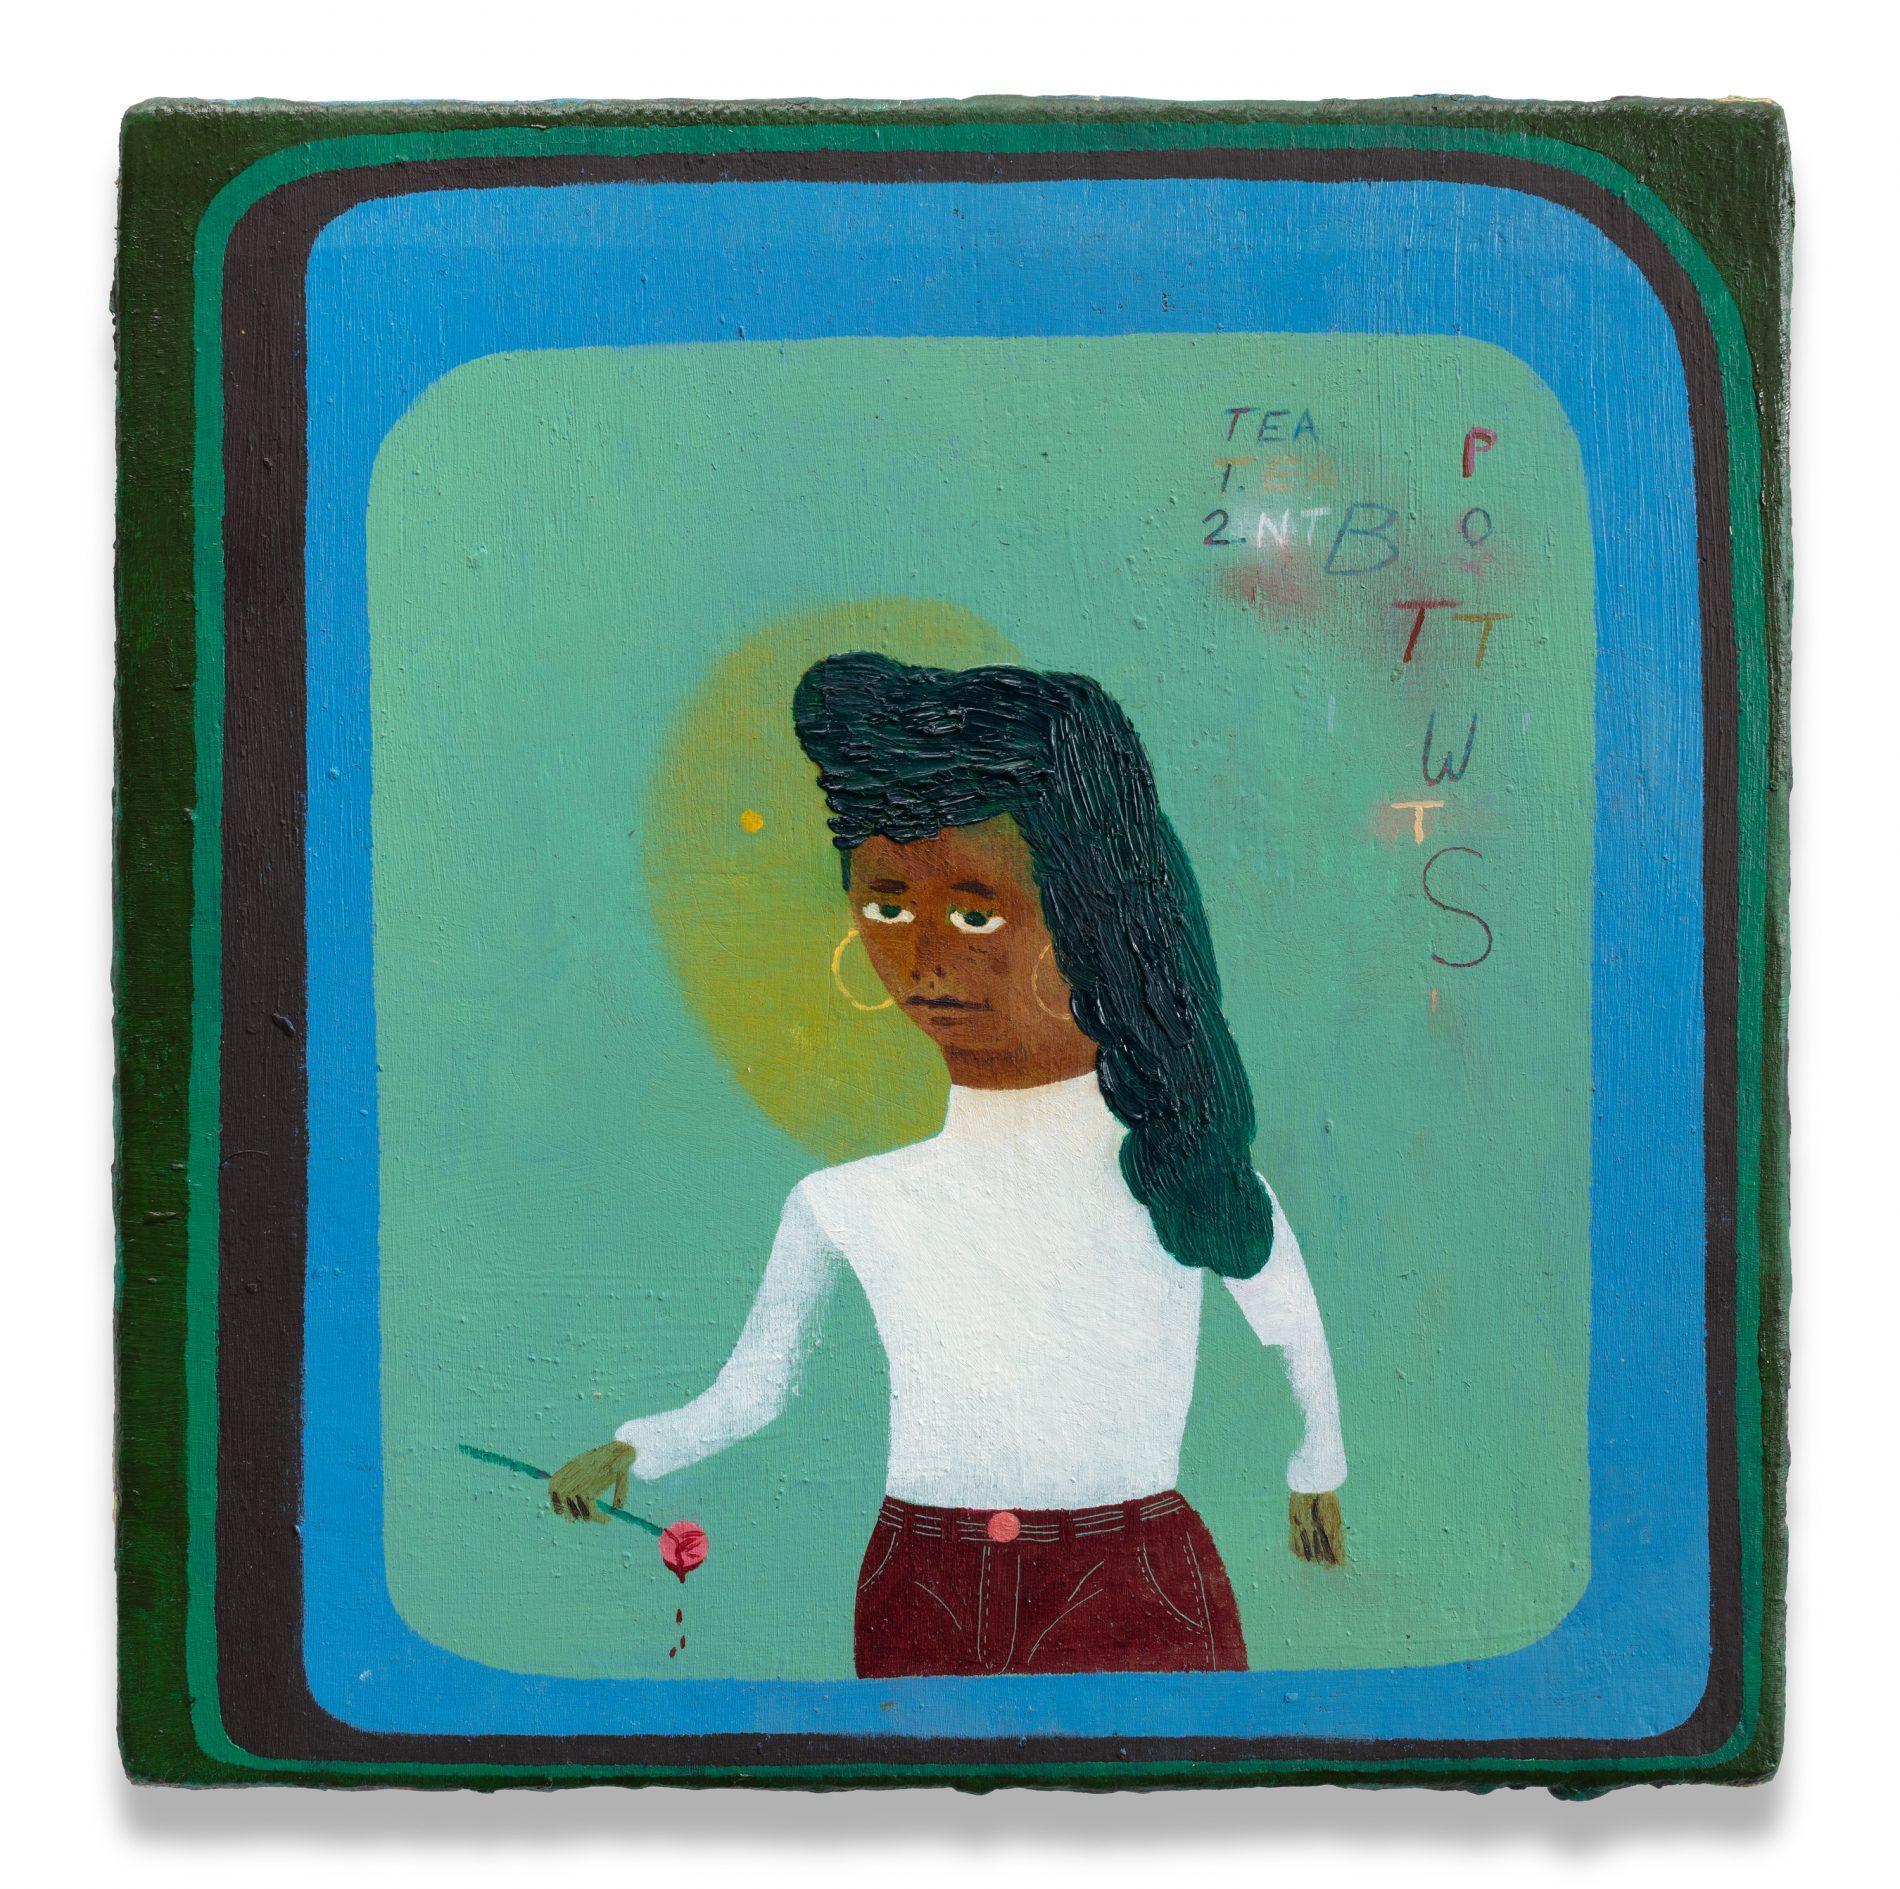 "Kenny Rivero, ""I Still Hoop,"" 2020. Courtesy of Charles Moffett and the artist."